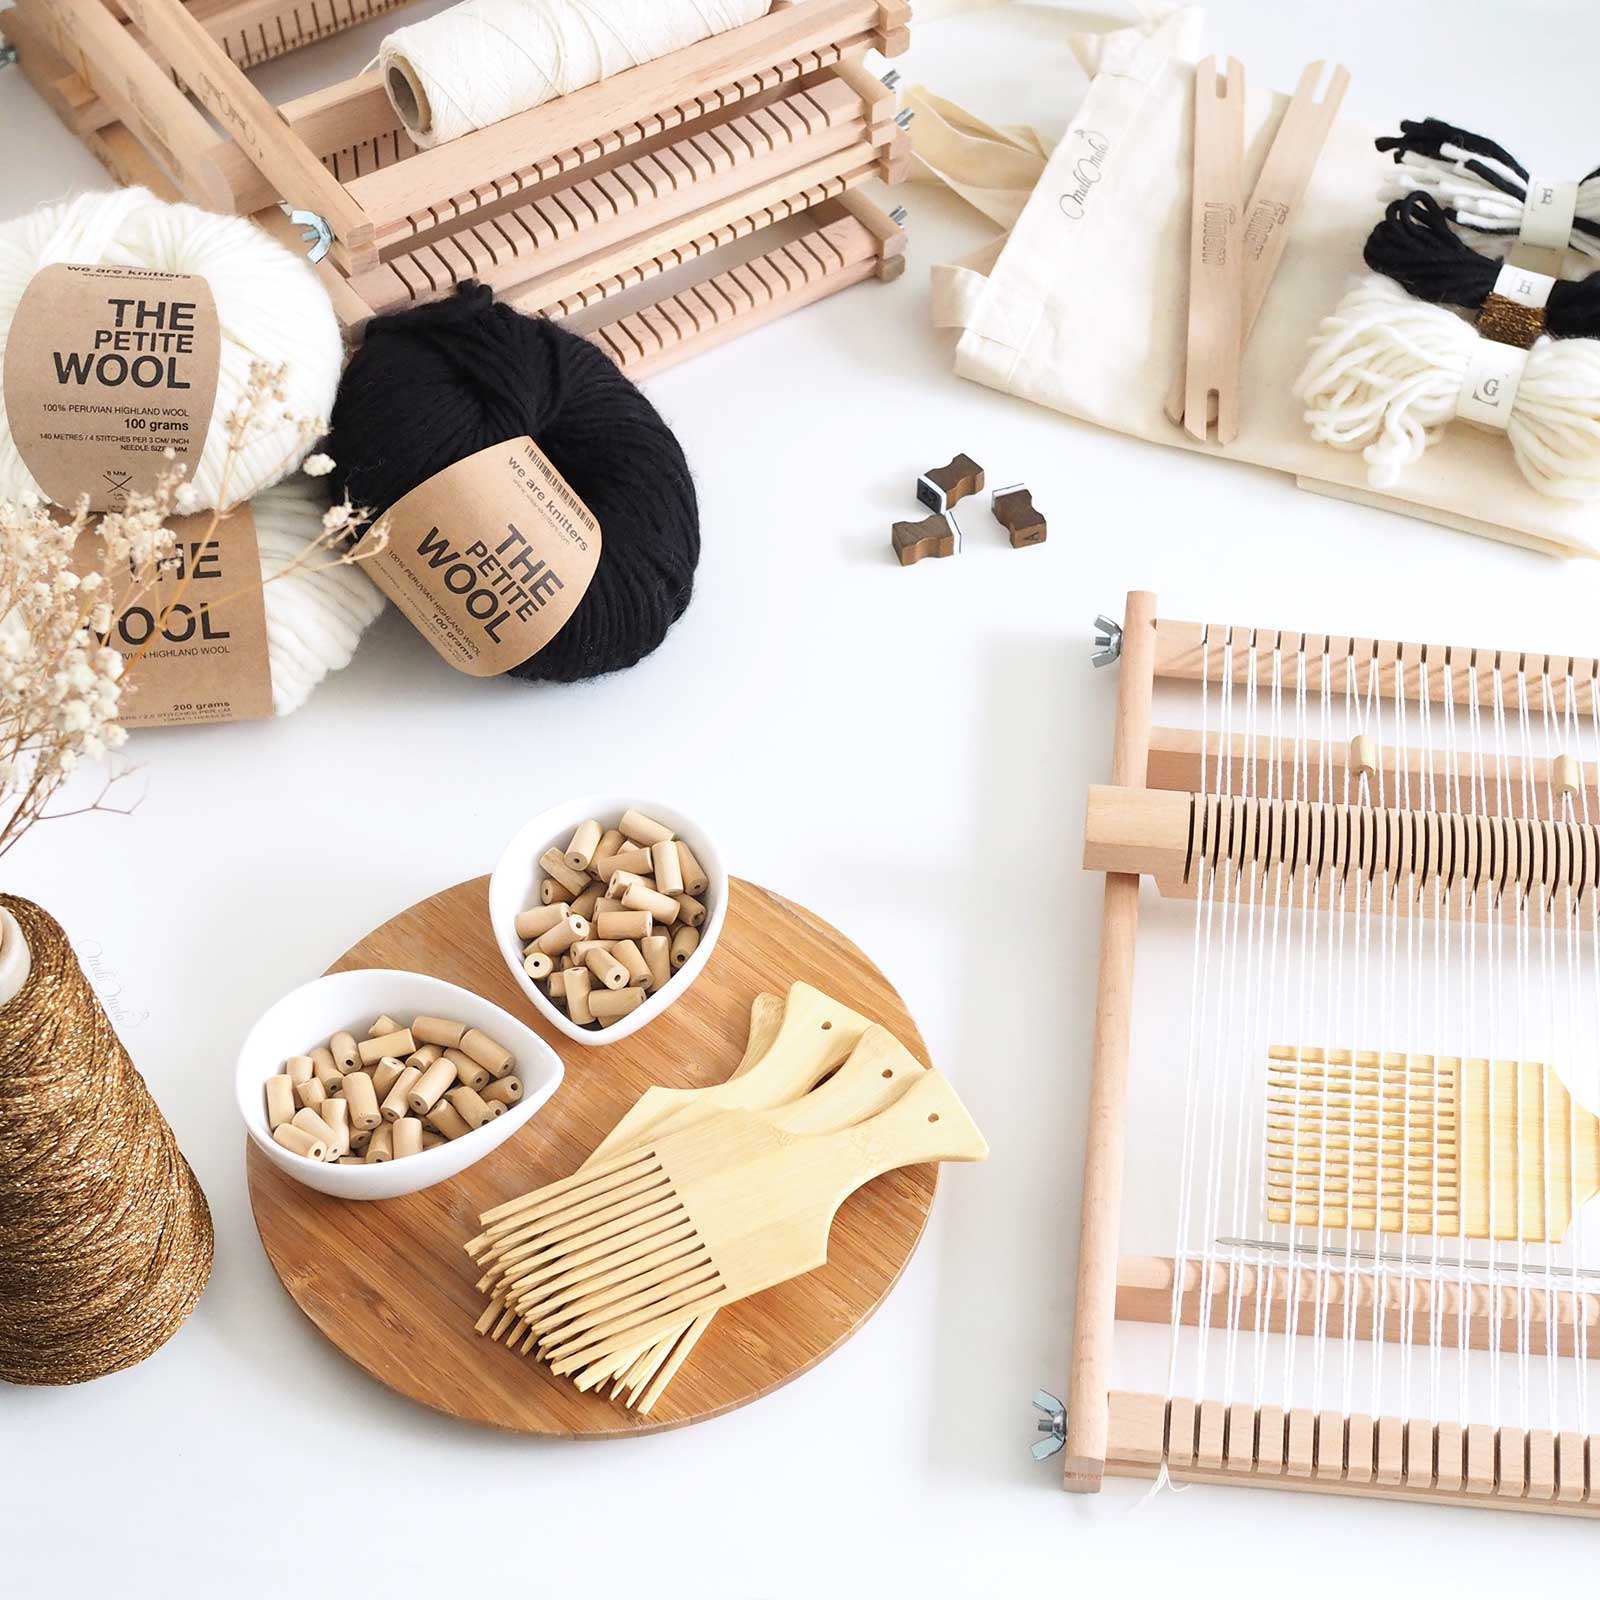 kit-lana-DIY-telar-lana-destellos-oro-negro-blanco-weareknitters-laboutiquedemelimelo